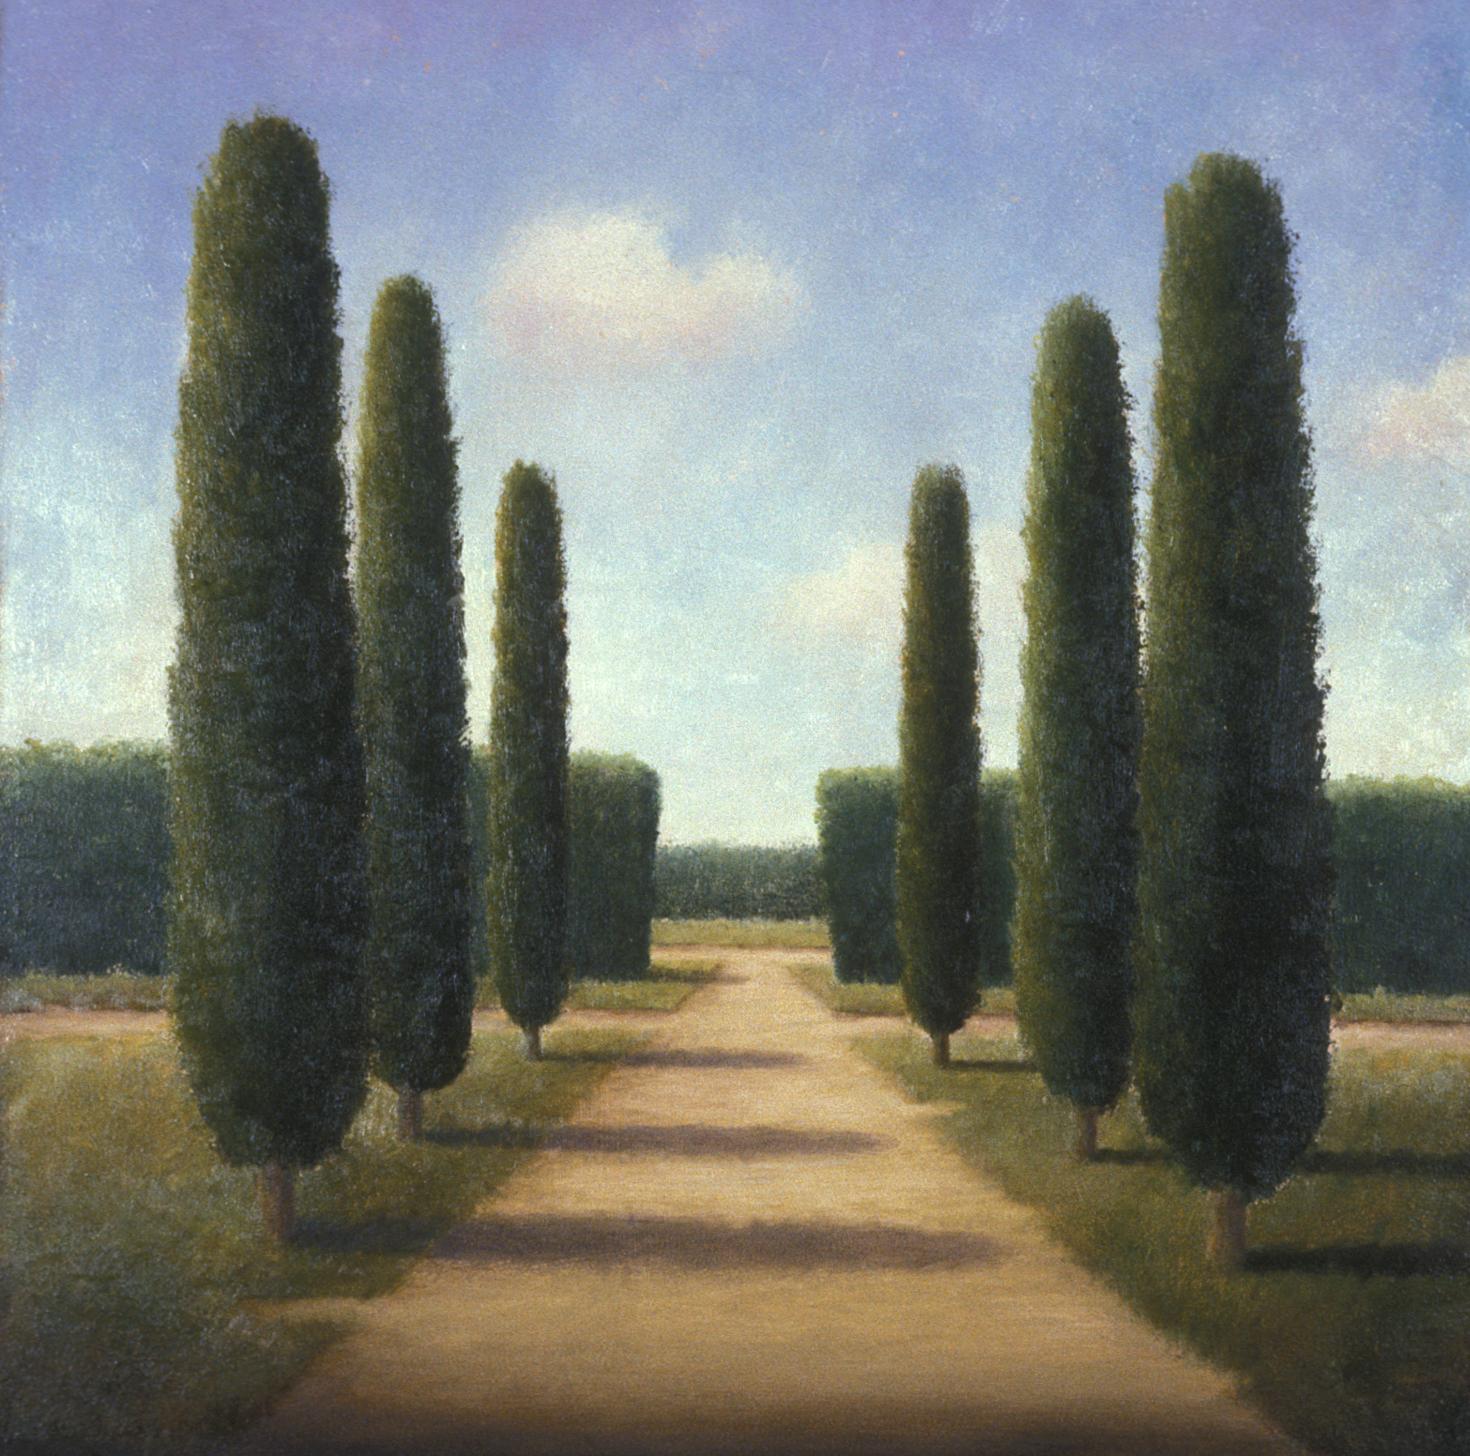 Cypress-lined Vista